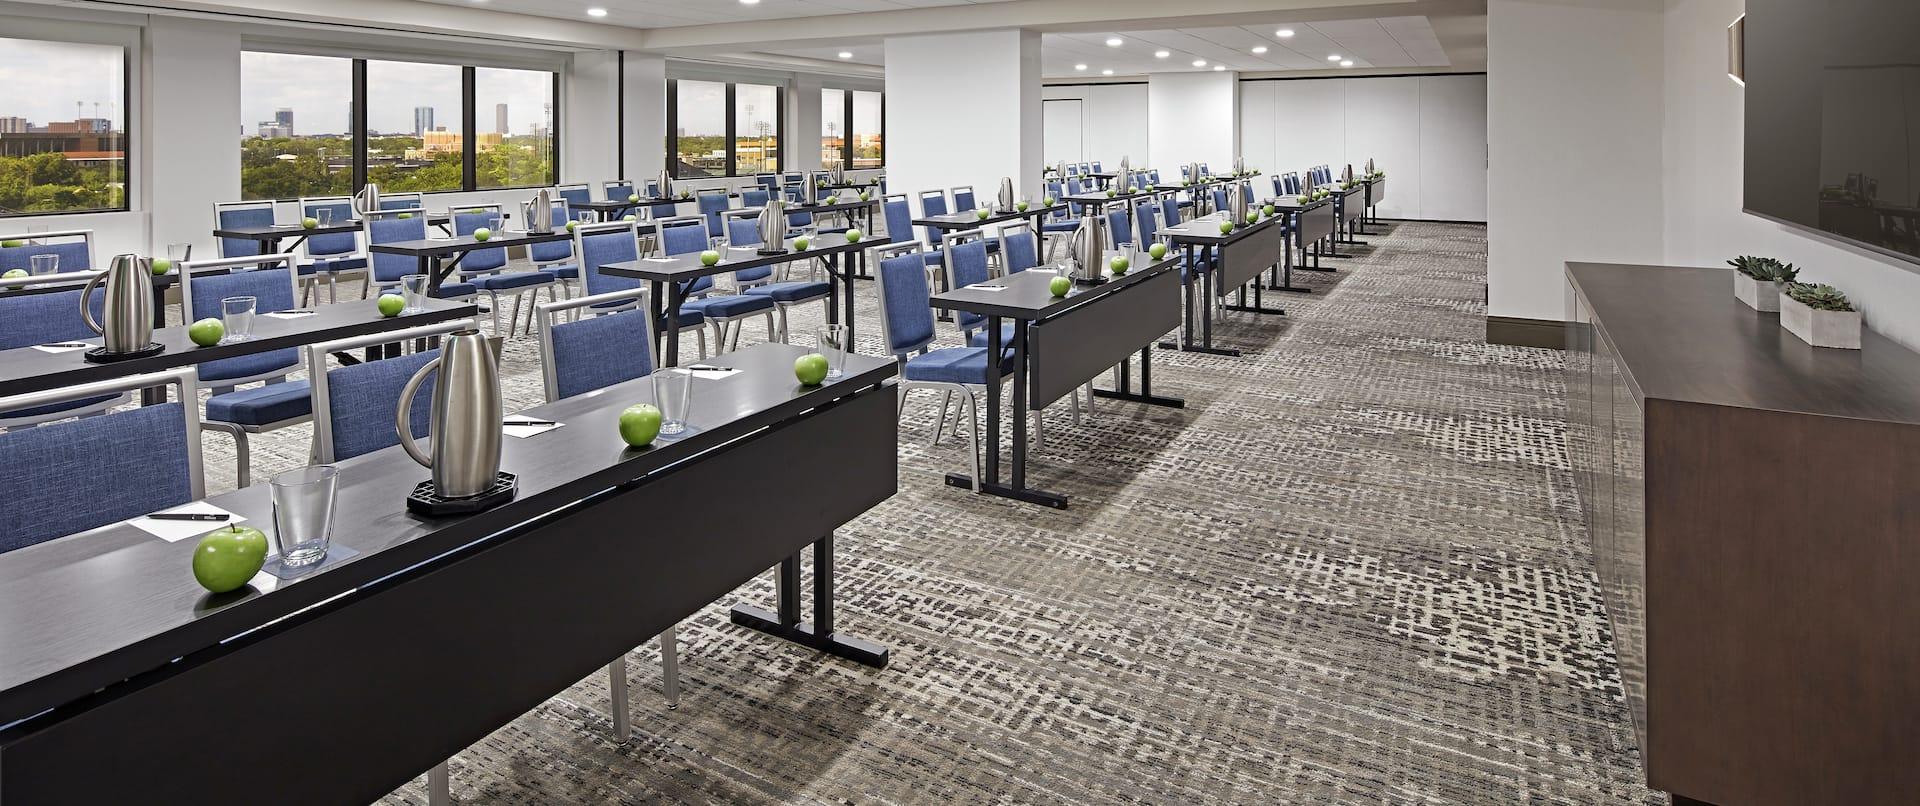 Travis AB Meeting Room Set Classroom